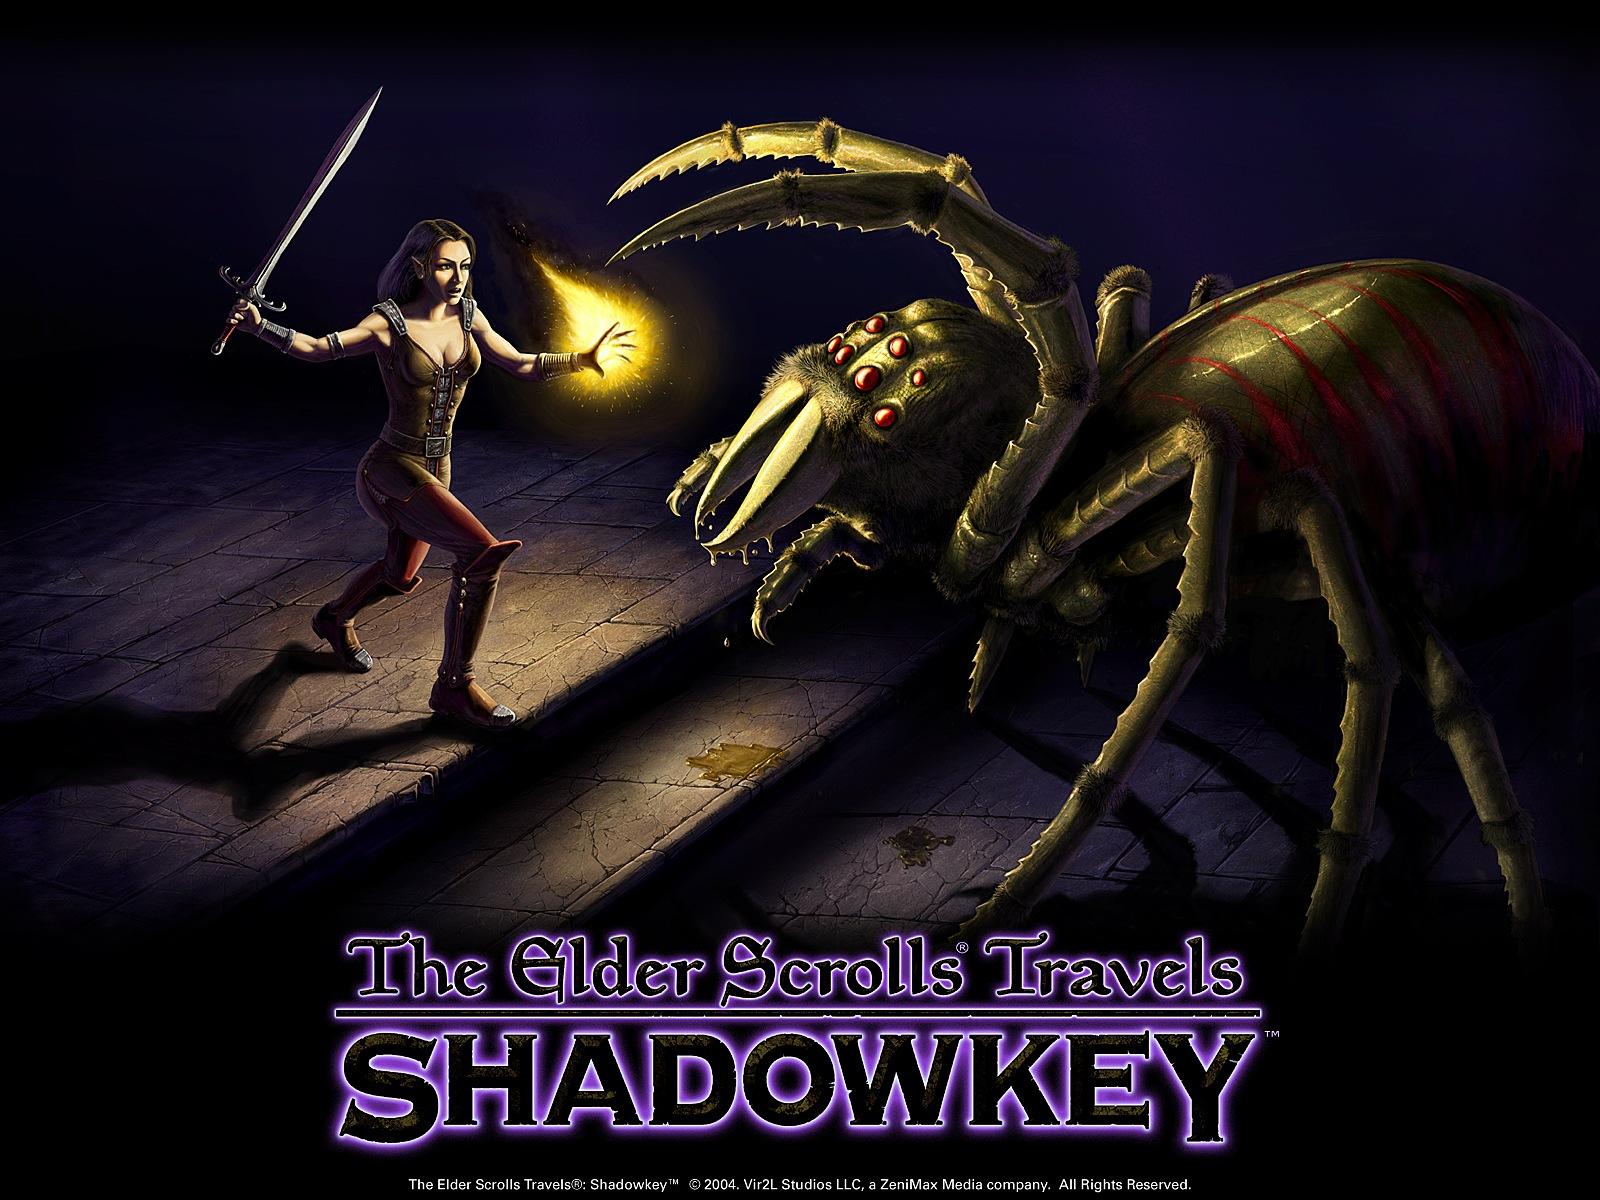 the elder scrolls travels shadowkey fiche rpg reviews